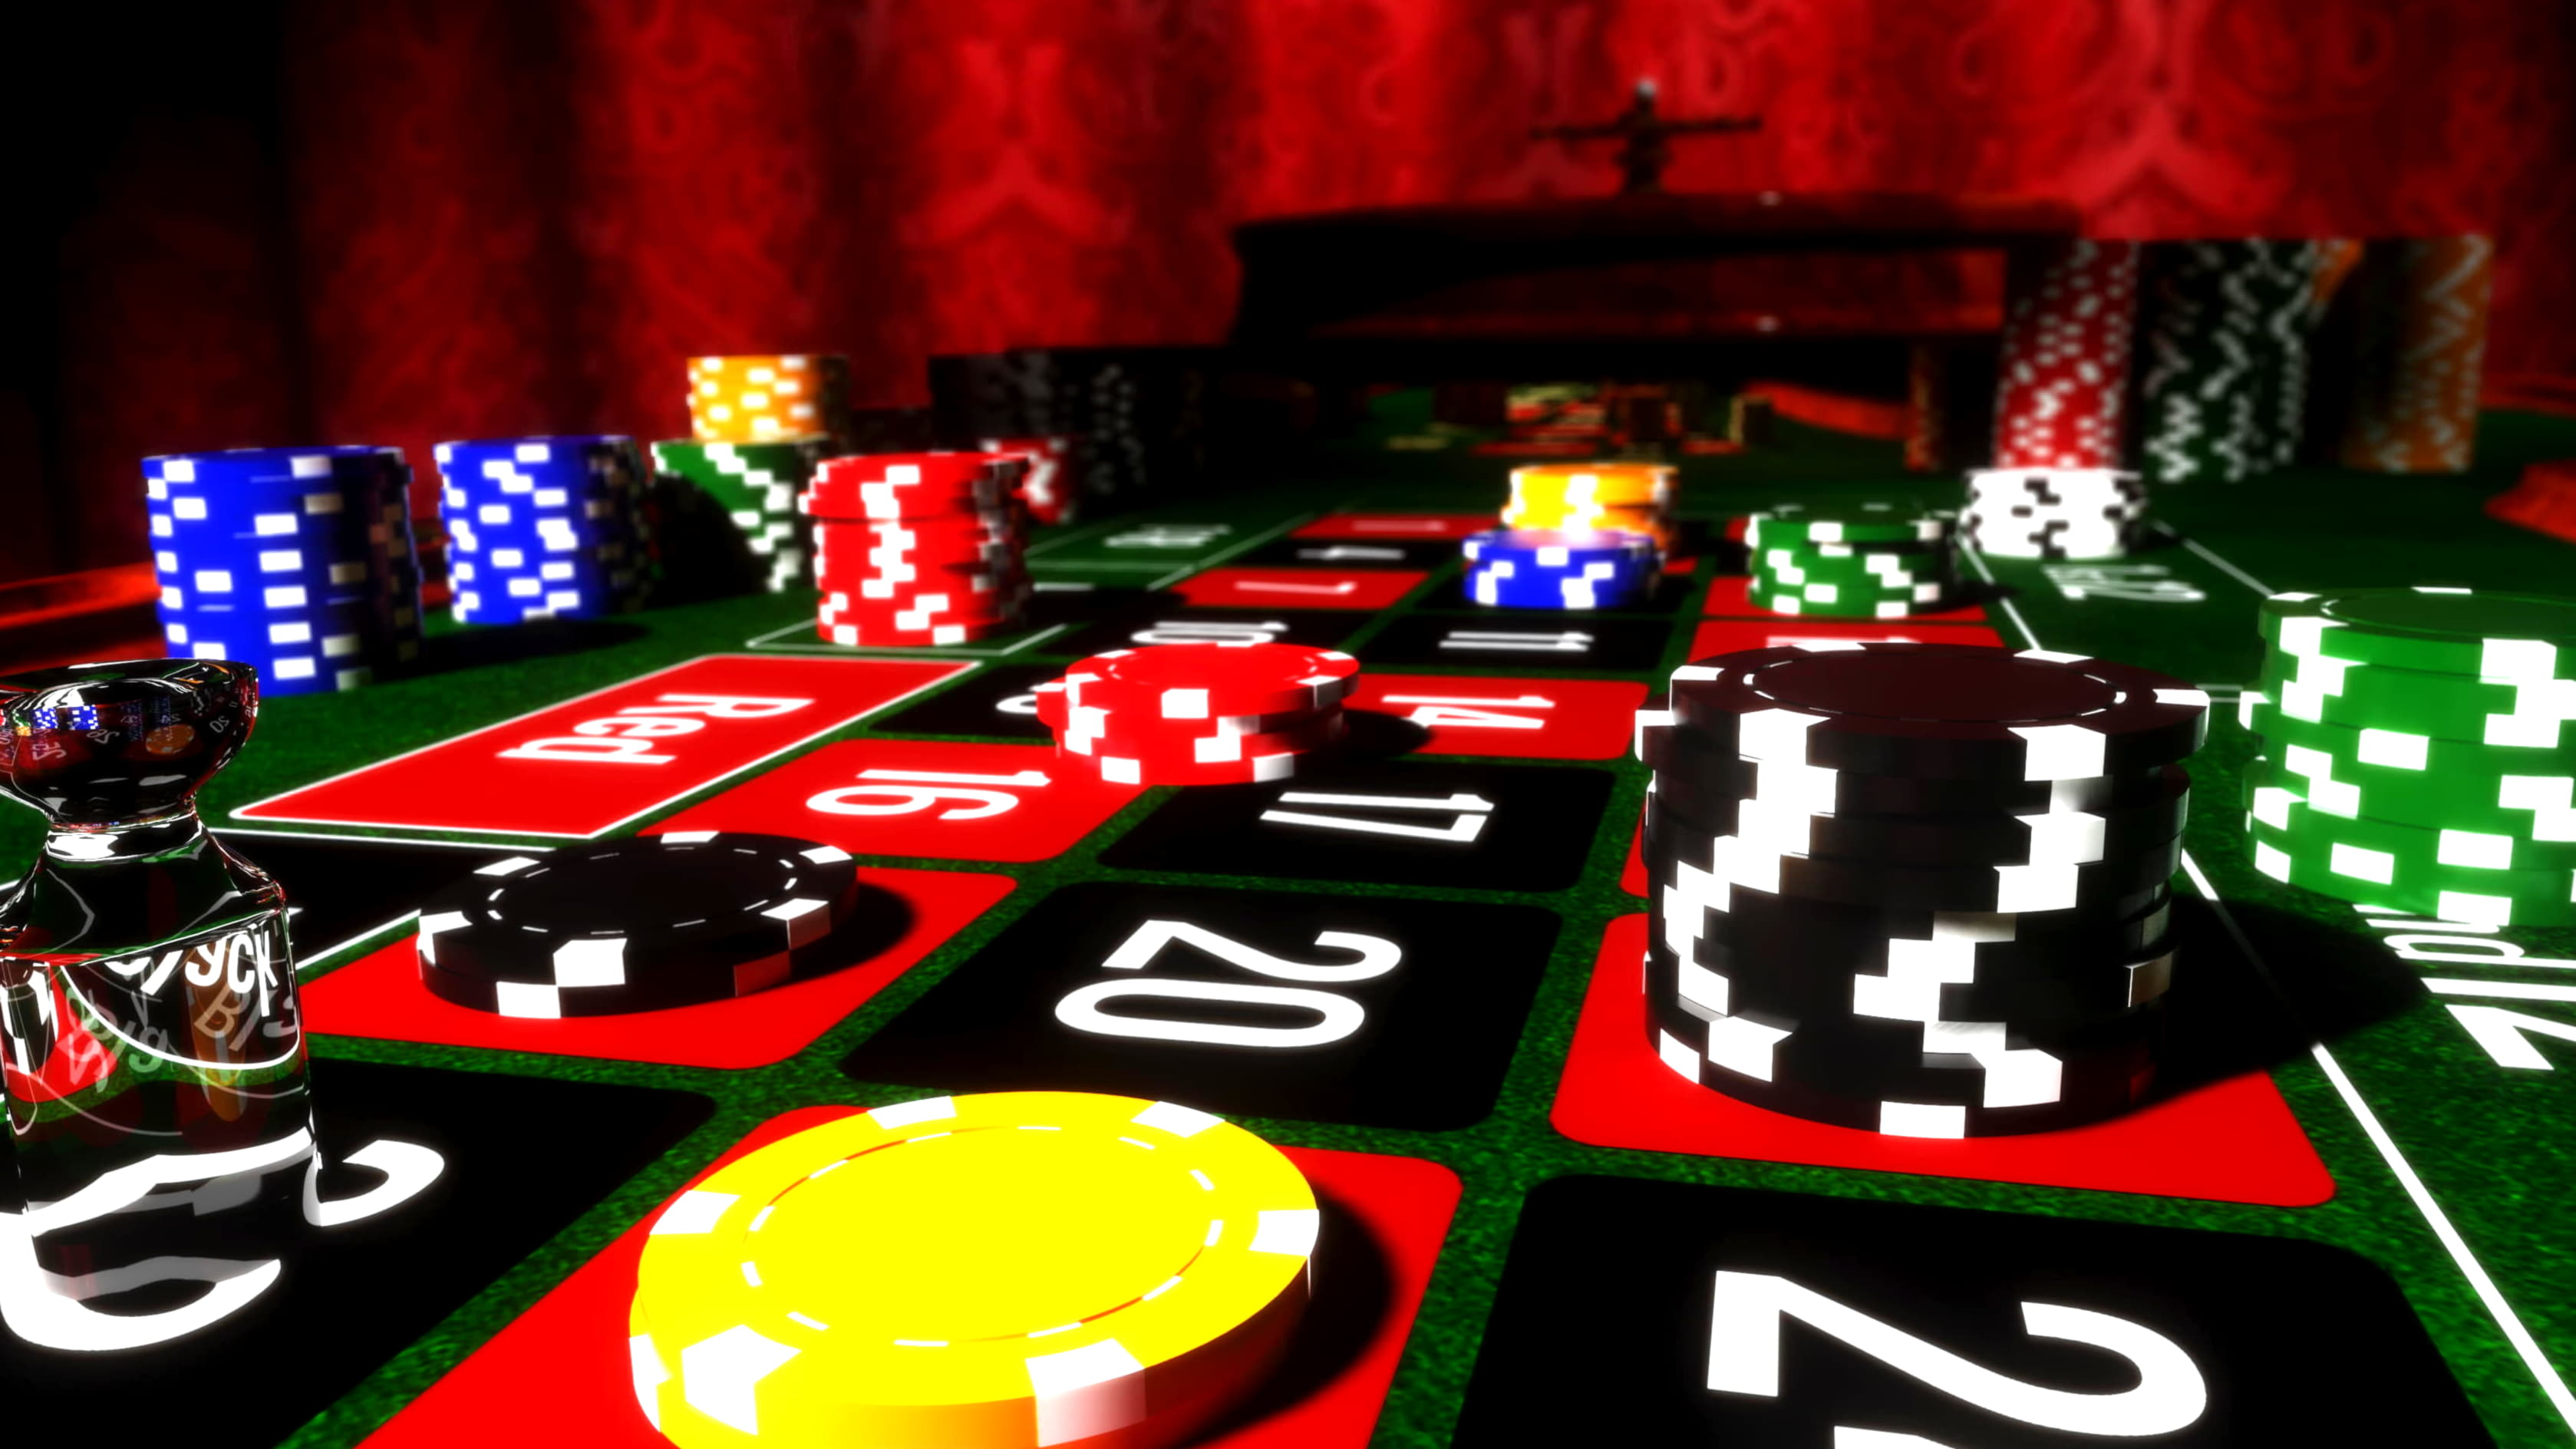 $710 Mobile freeroll slot tournament at Gluck24 Casino